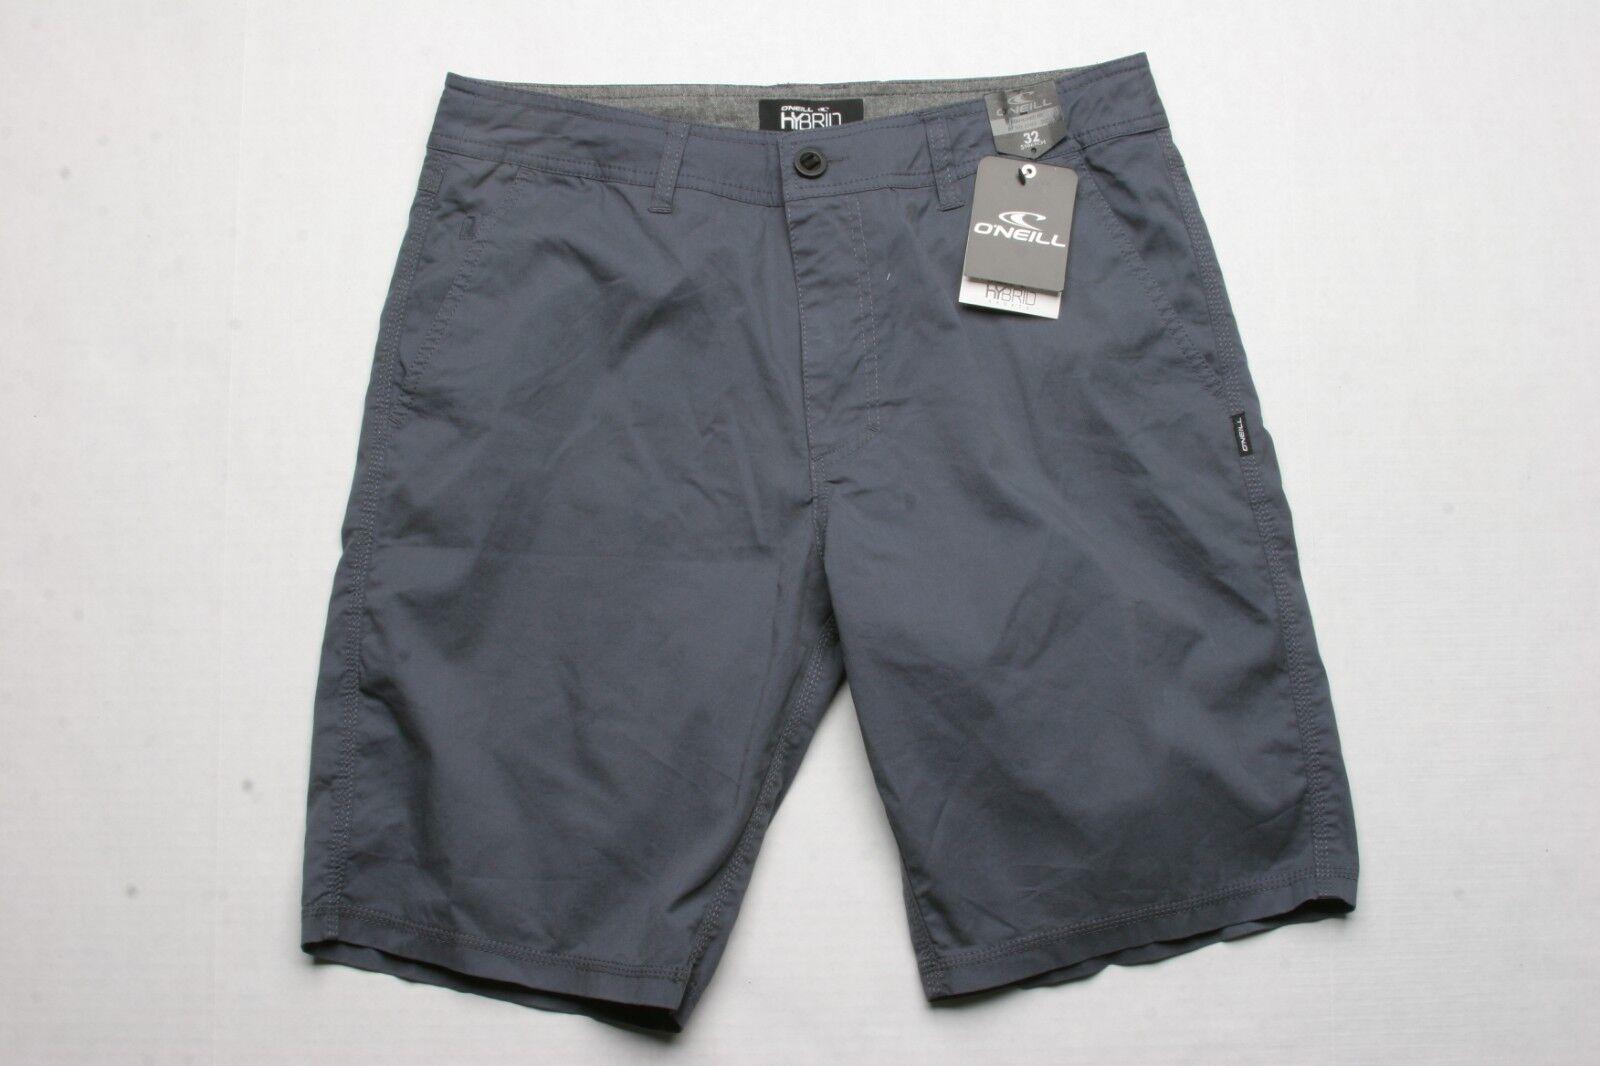 O'Neill Coolidge Workwear Hybrid Short (32) Slate